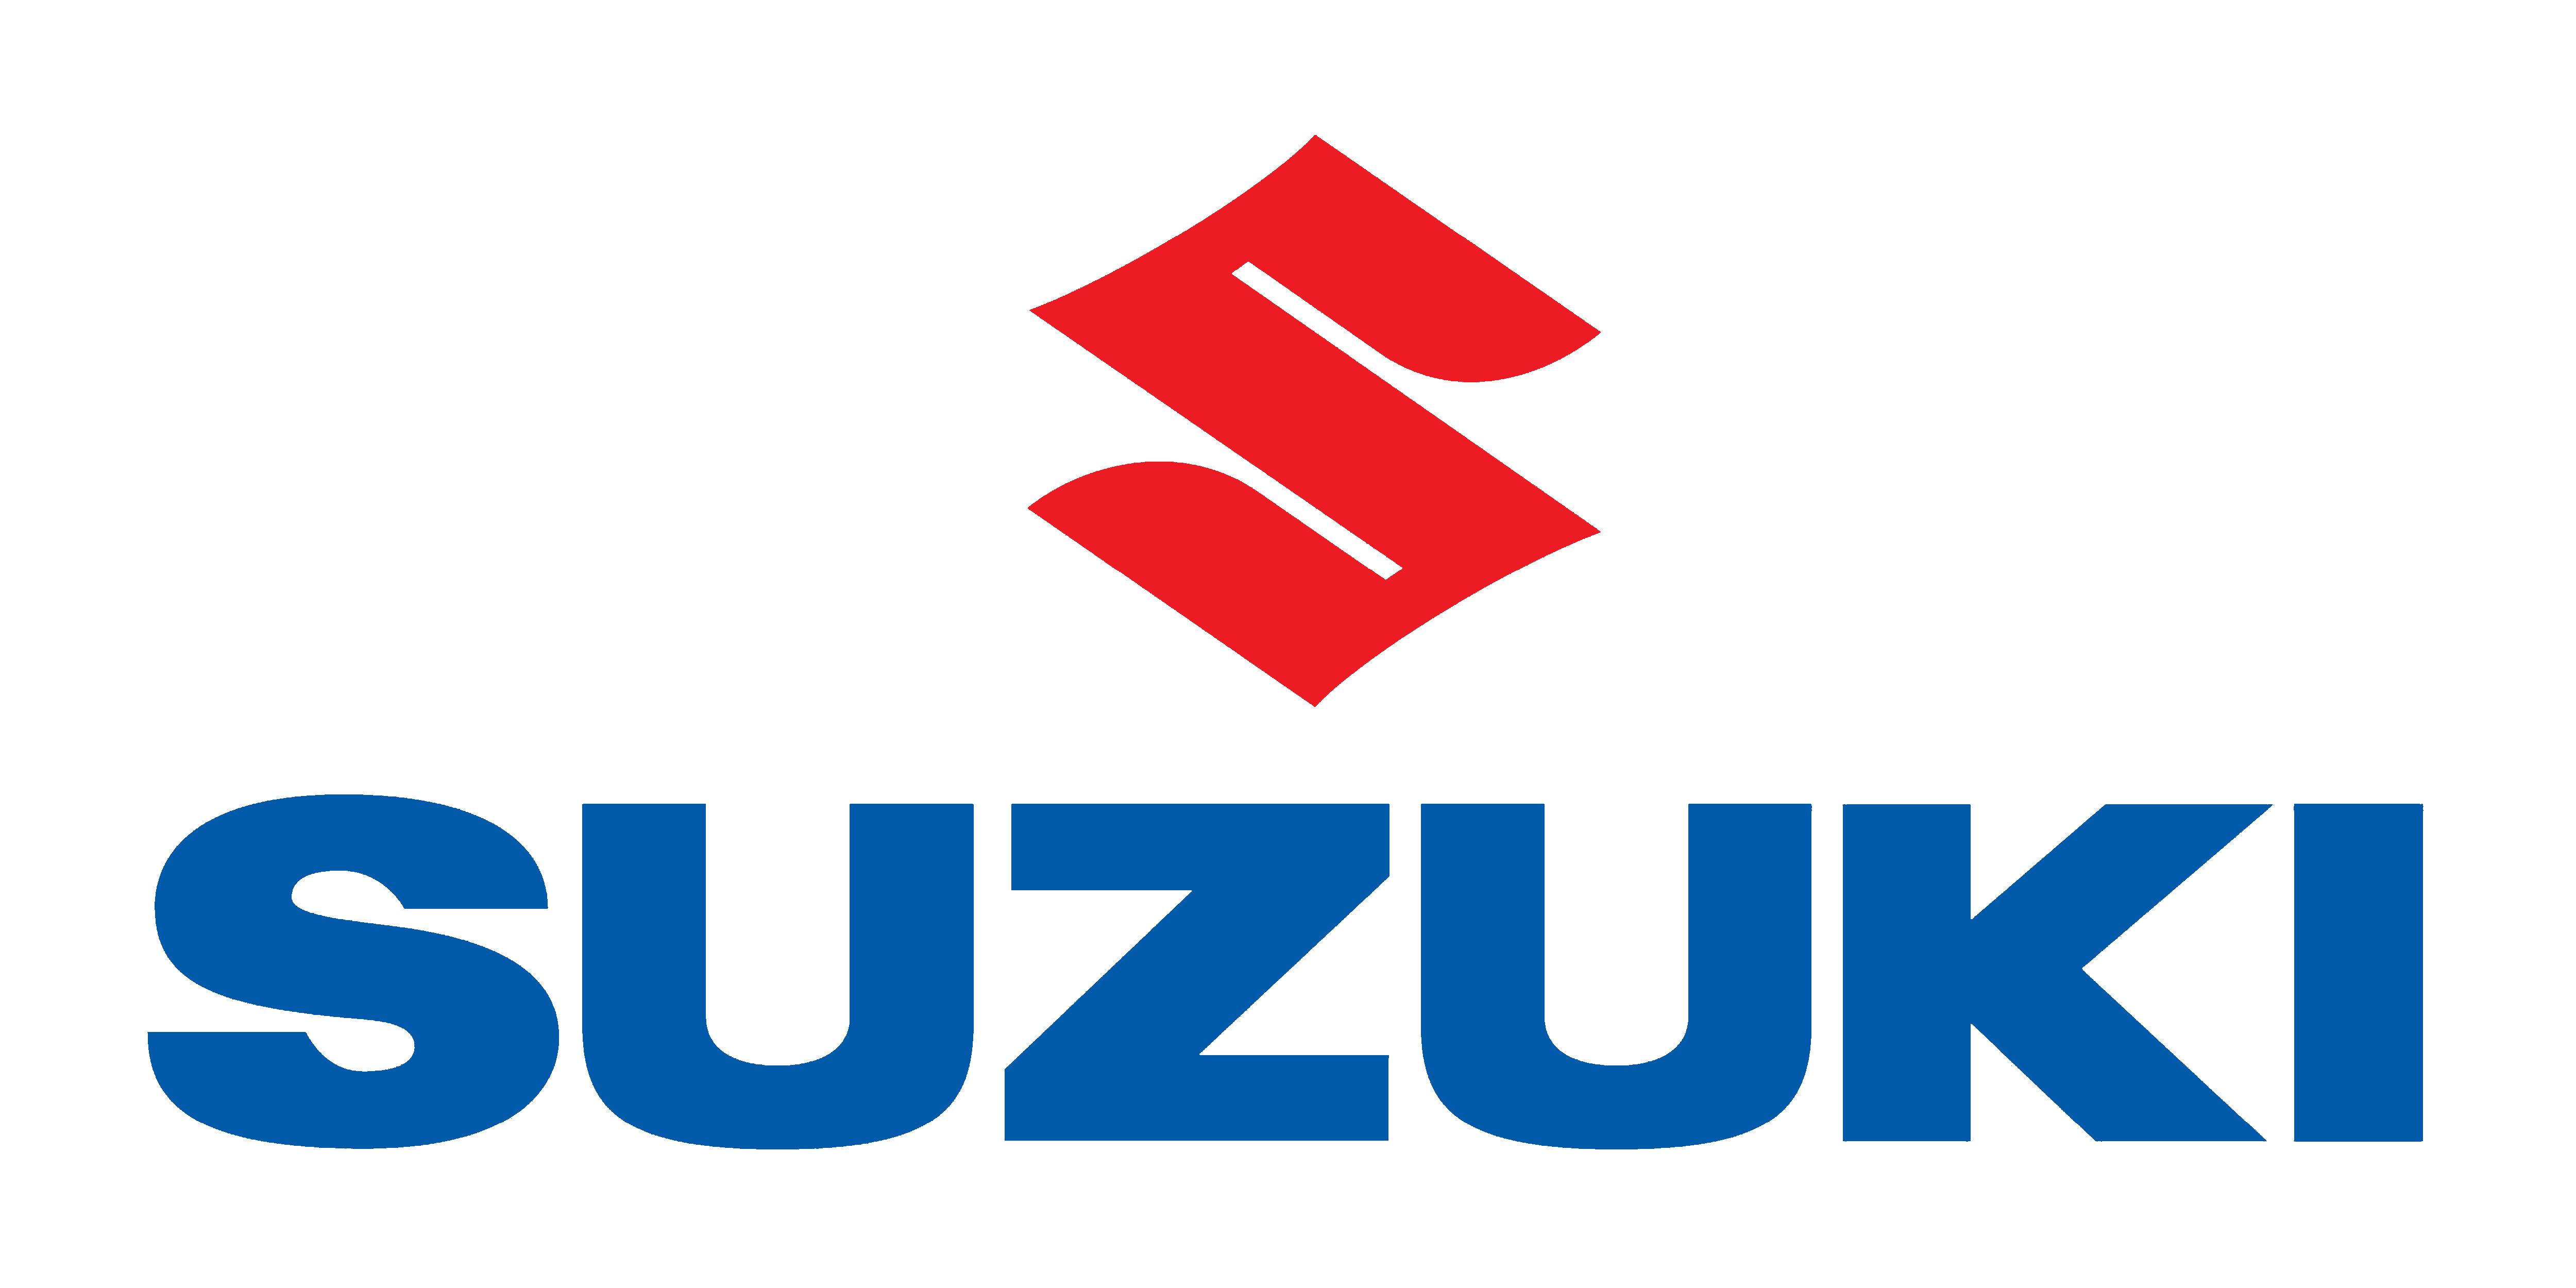 Suzuki Logo (Present) 5000x2500 HD png Logo color